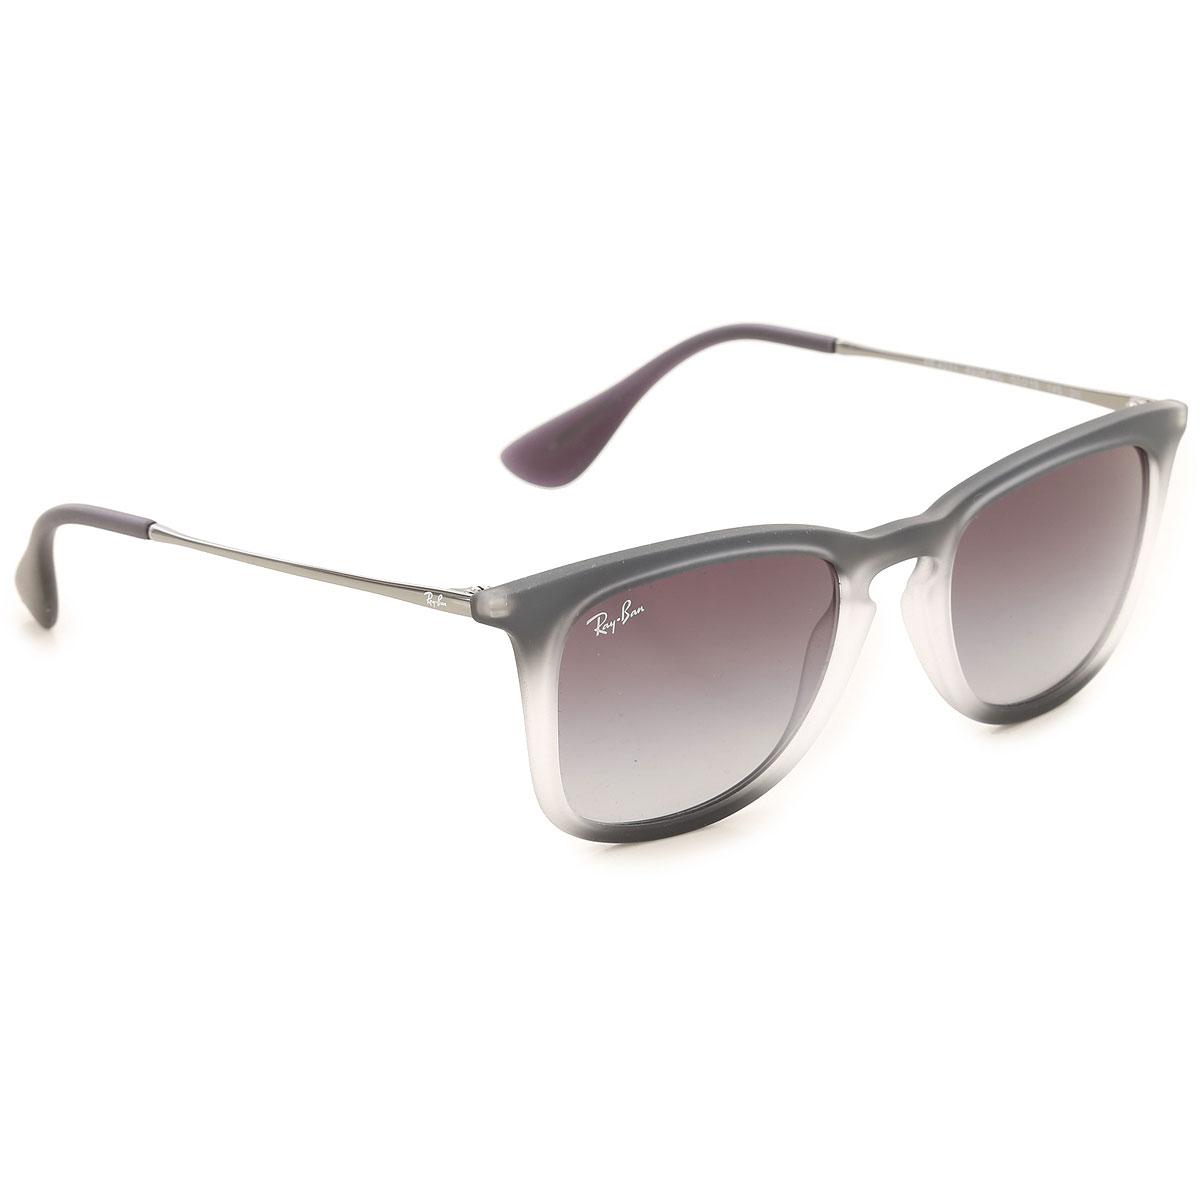 Ray Ban Sunglasses On Sale, Shaded Grey, 2019